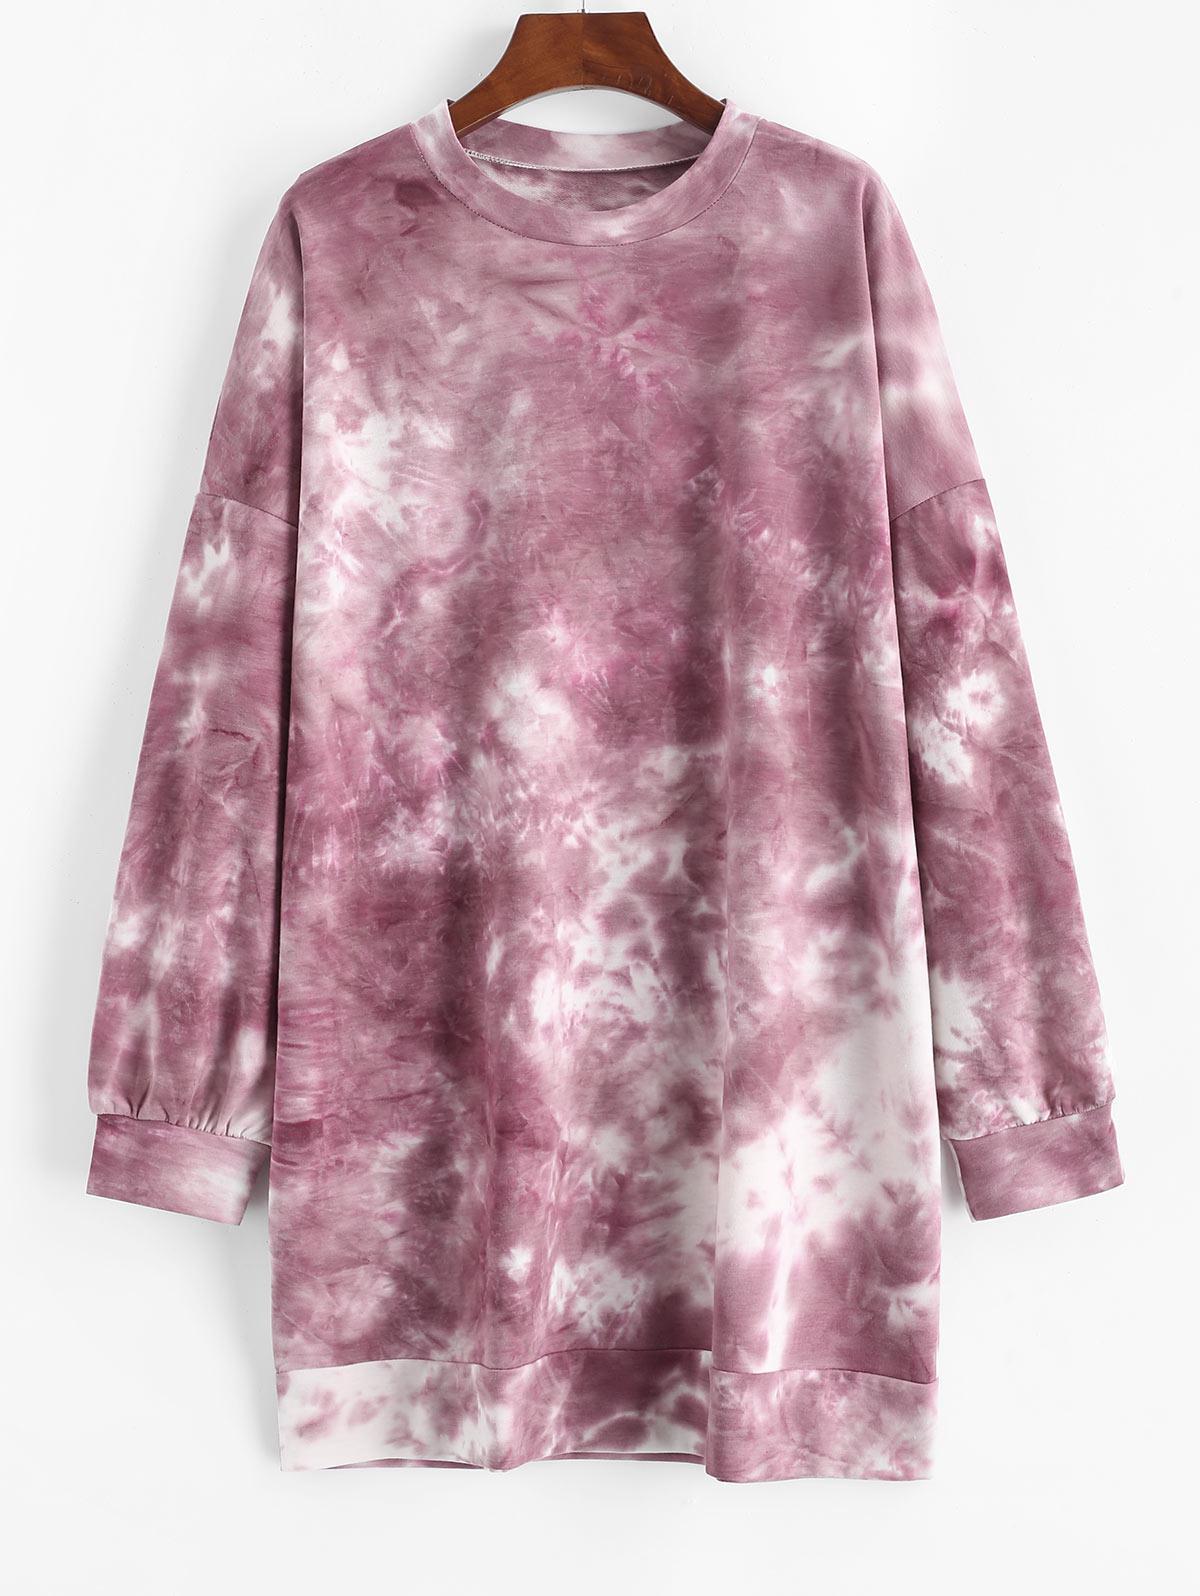 Robe Pull Teintée à Goutte Epaule Surdimensionné S - Zaful FR - Modalova